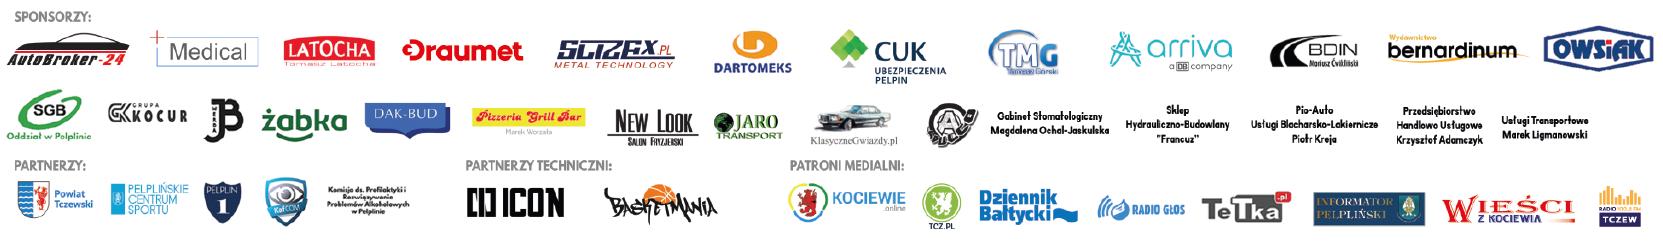 http://deckapelplin.pl/wp-content/uploads/2020/10/logotypy_dol.png